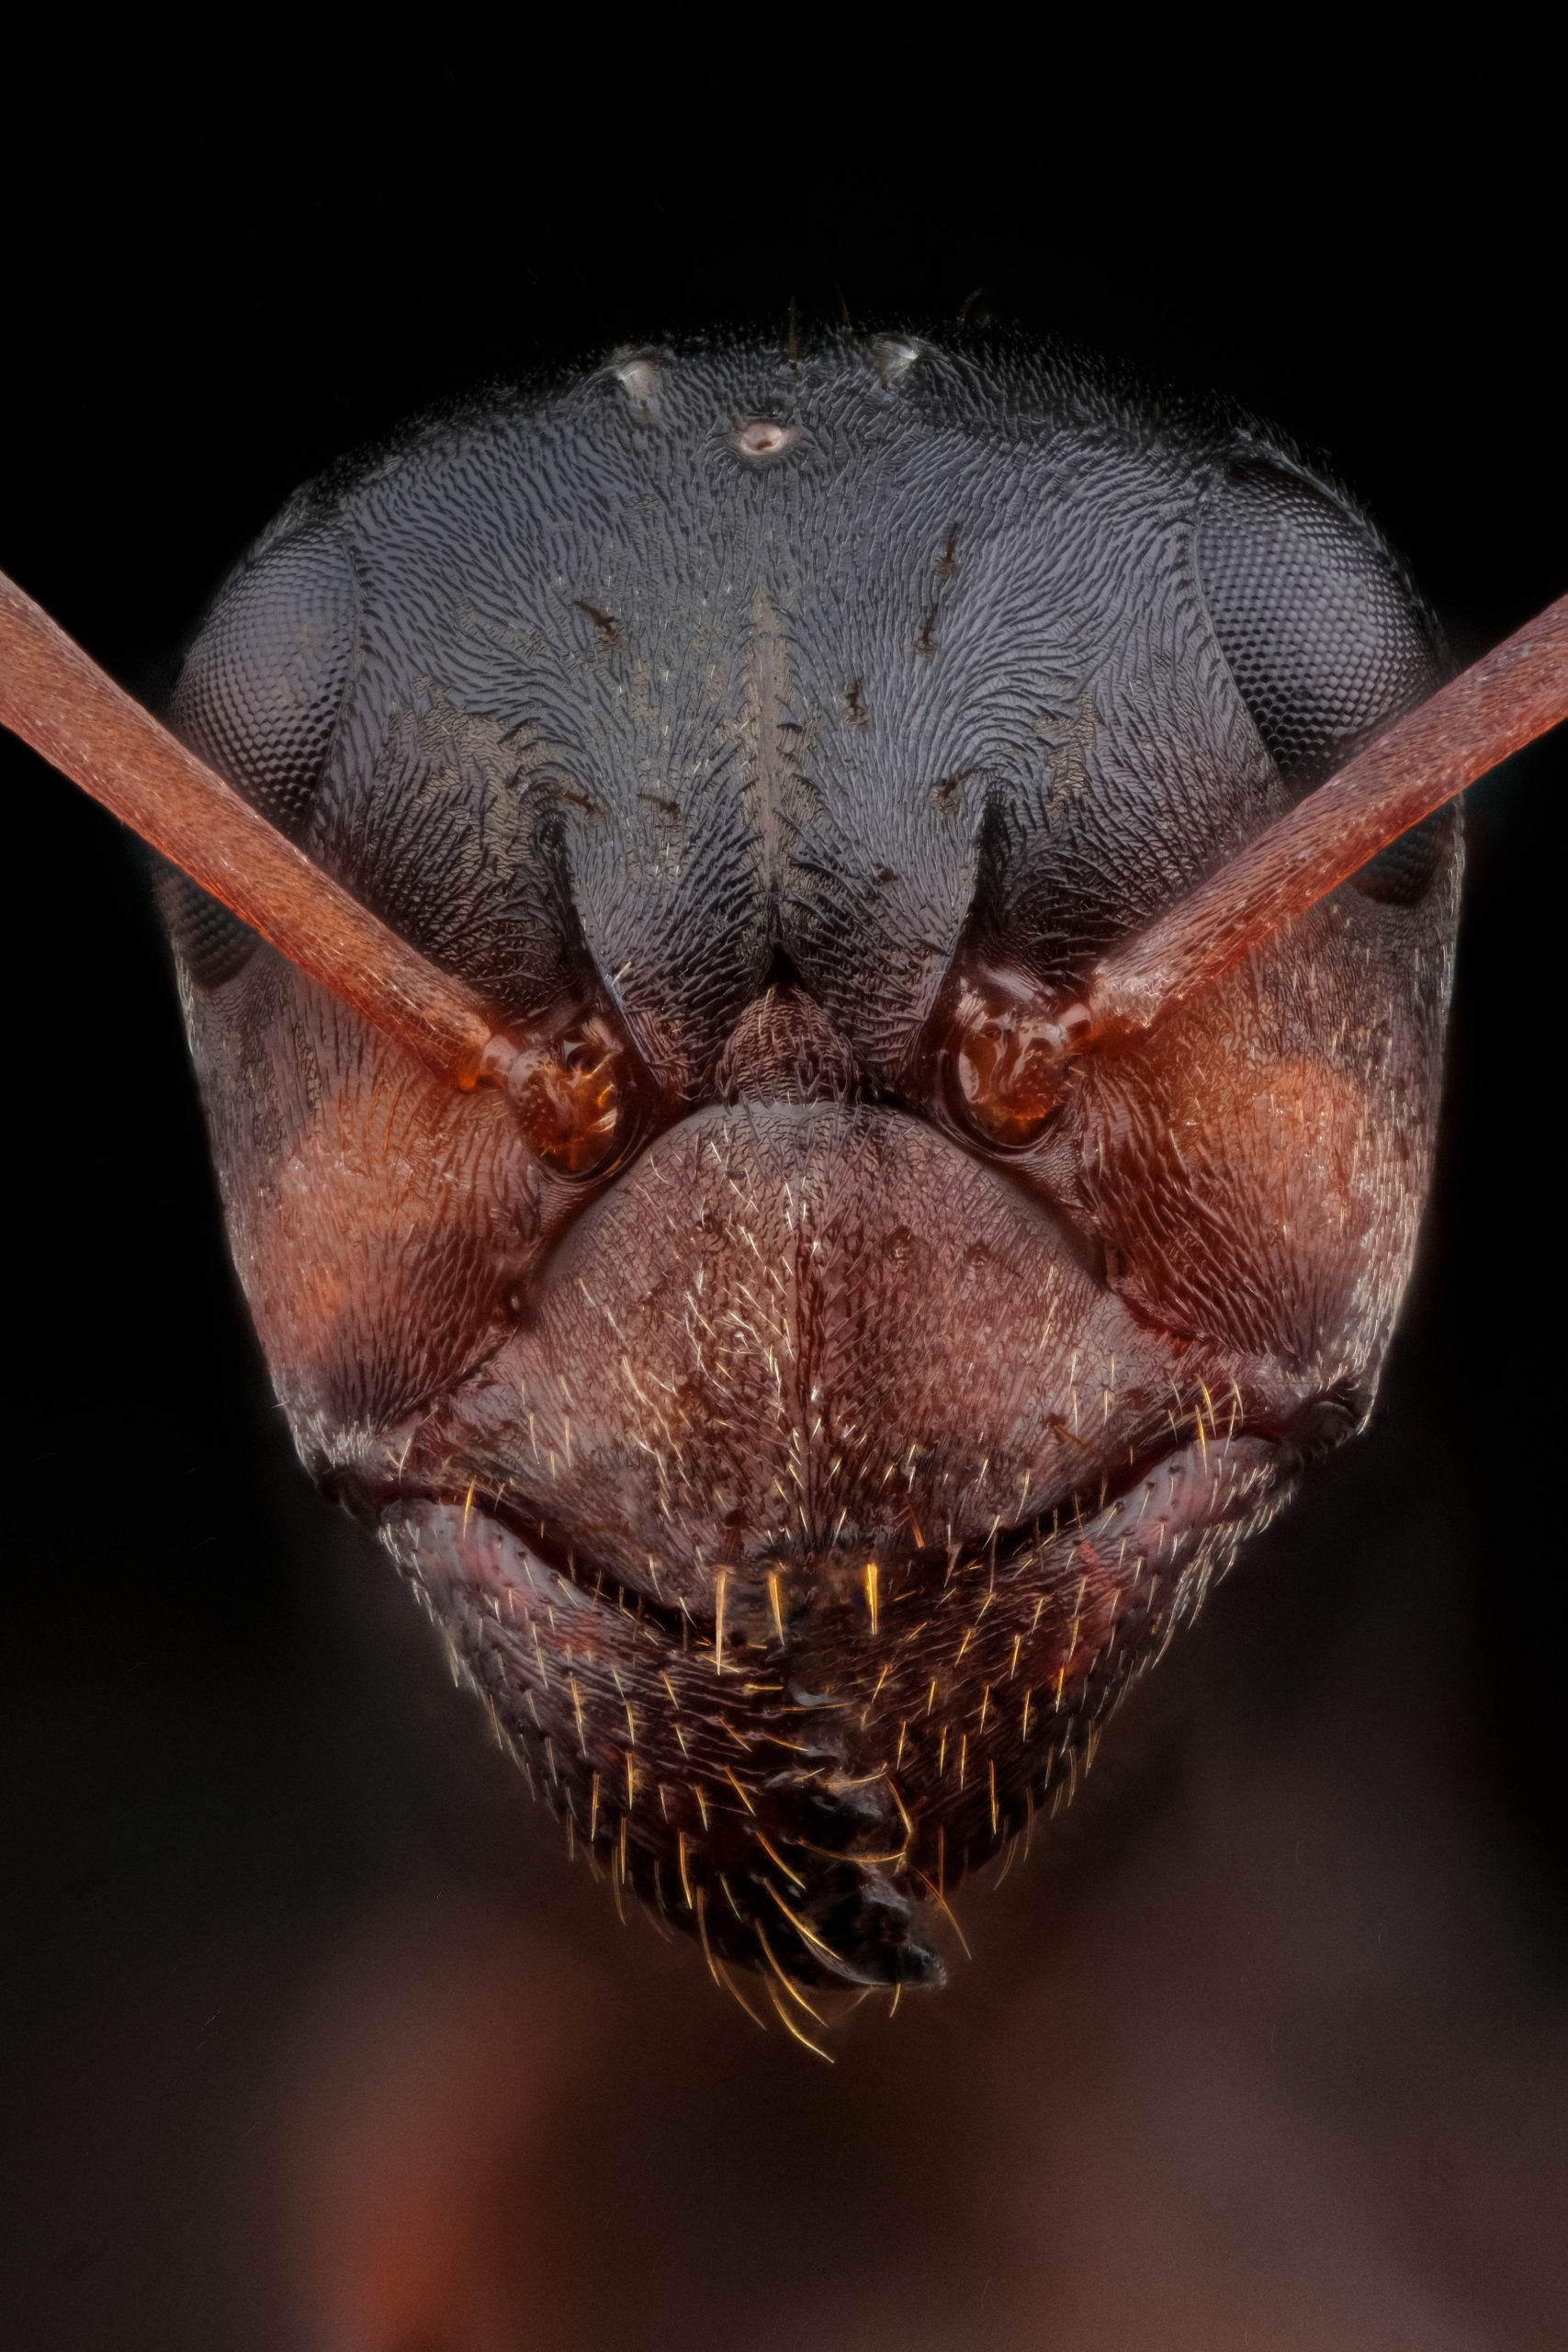 Formica rufibardis